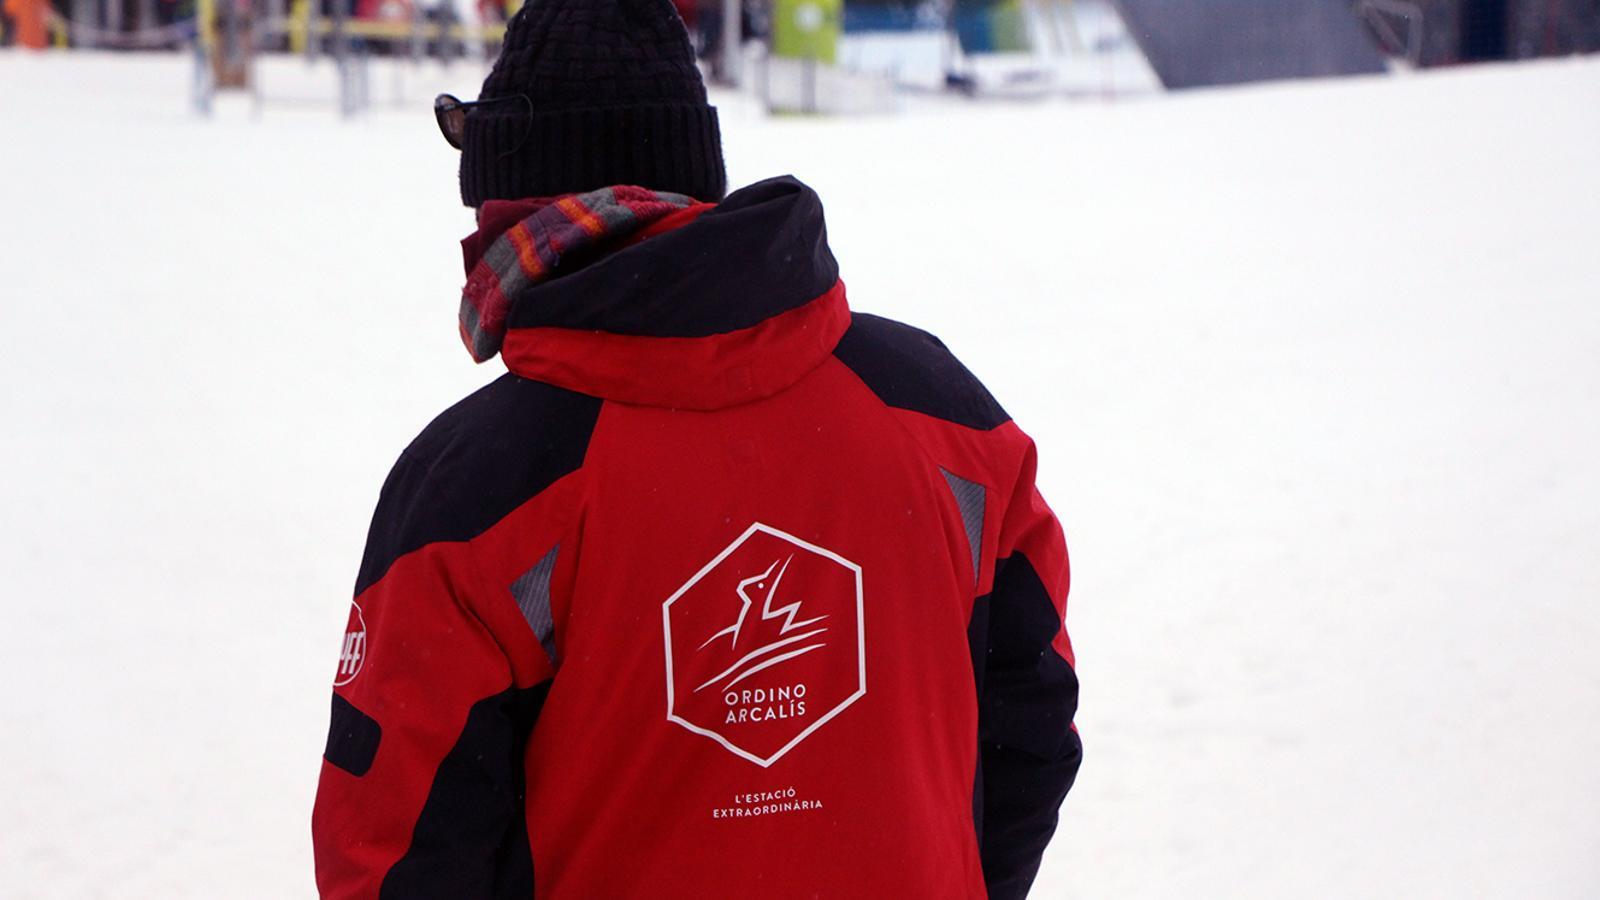 Un monitor d'esquí de Vallnord-Ordino Arcalís durant la temporada passada. / ARXIU ANA